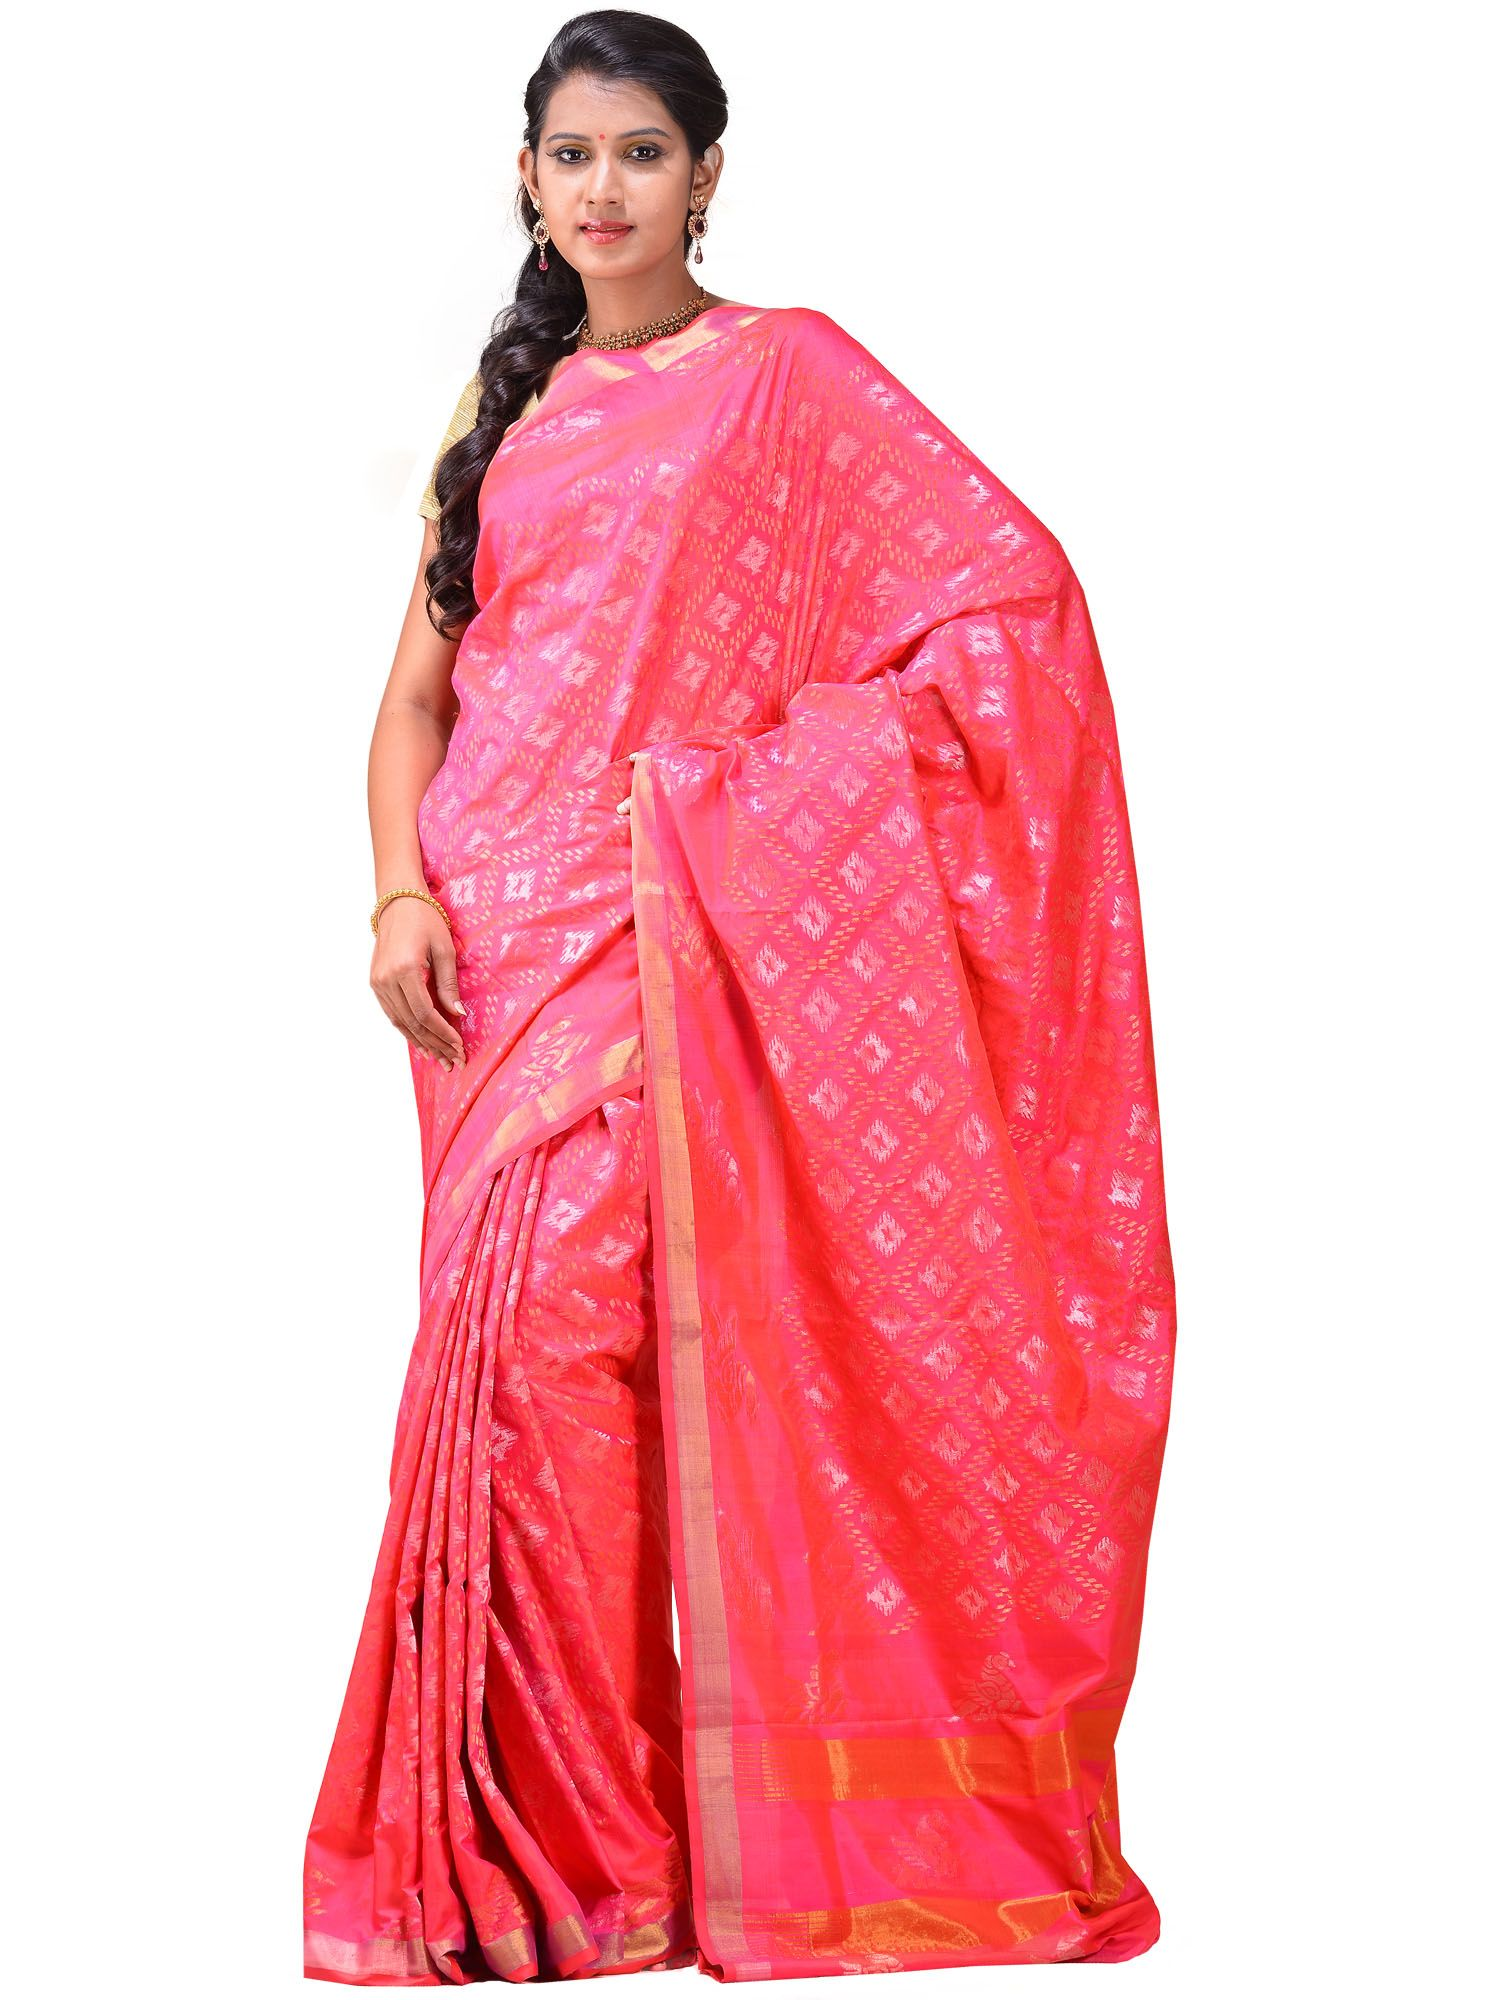 Tissue silk saree uppada sarees are known for light silk sarees with jamdani weaving